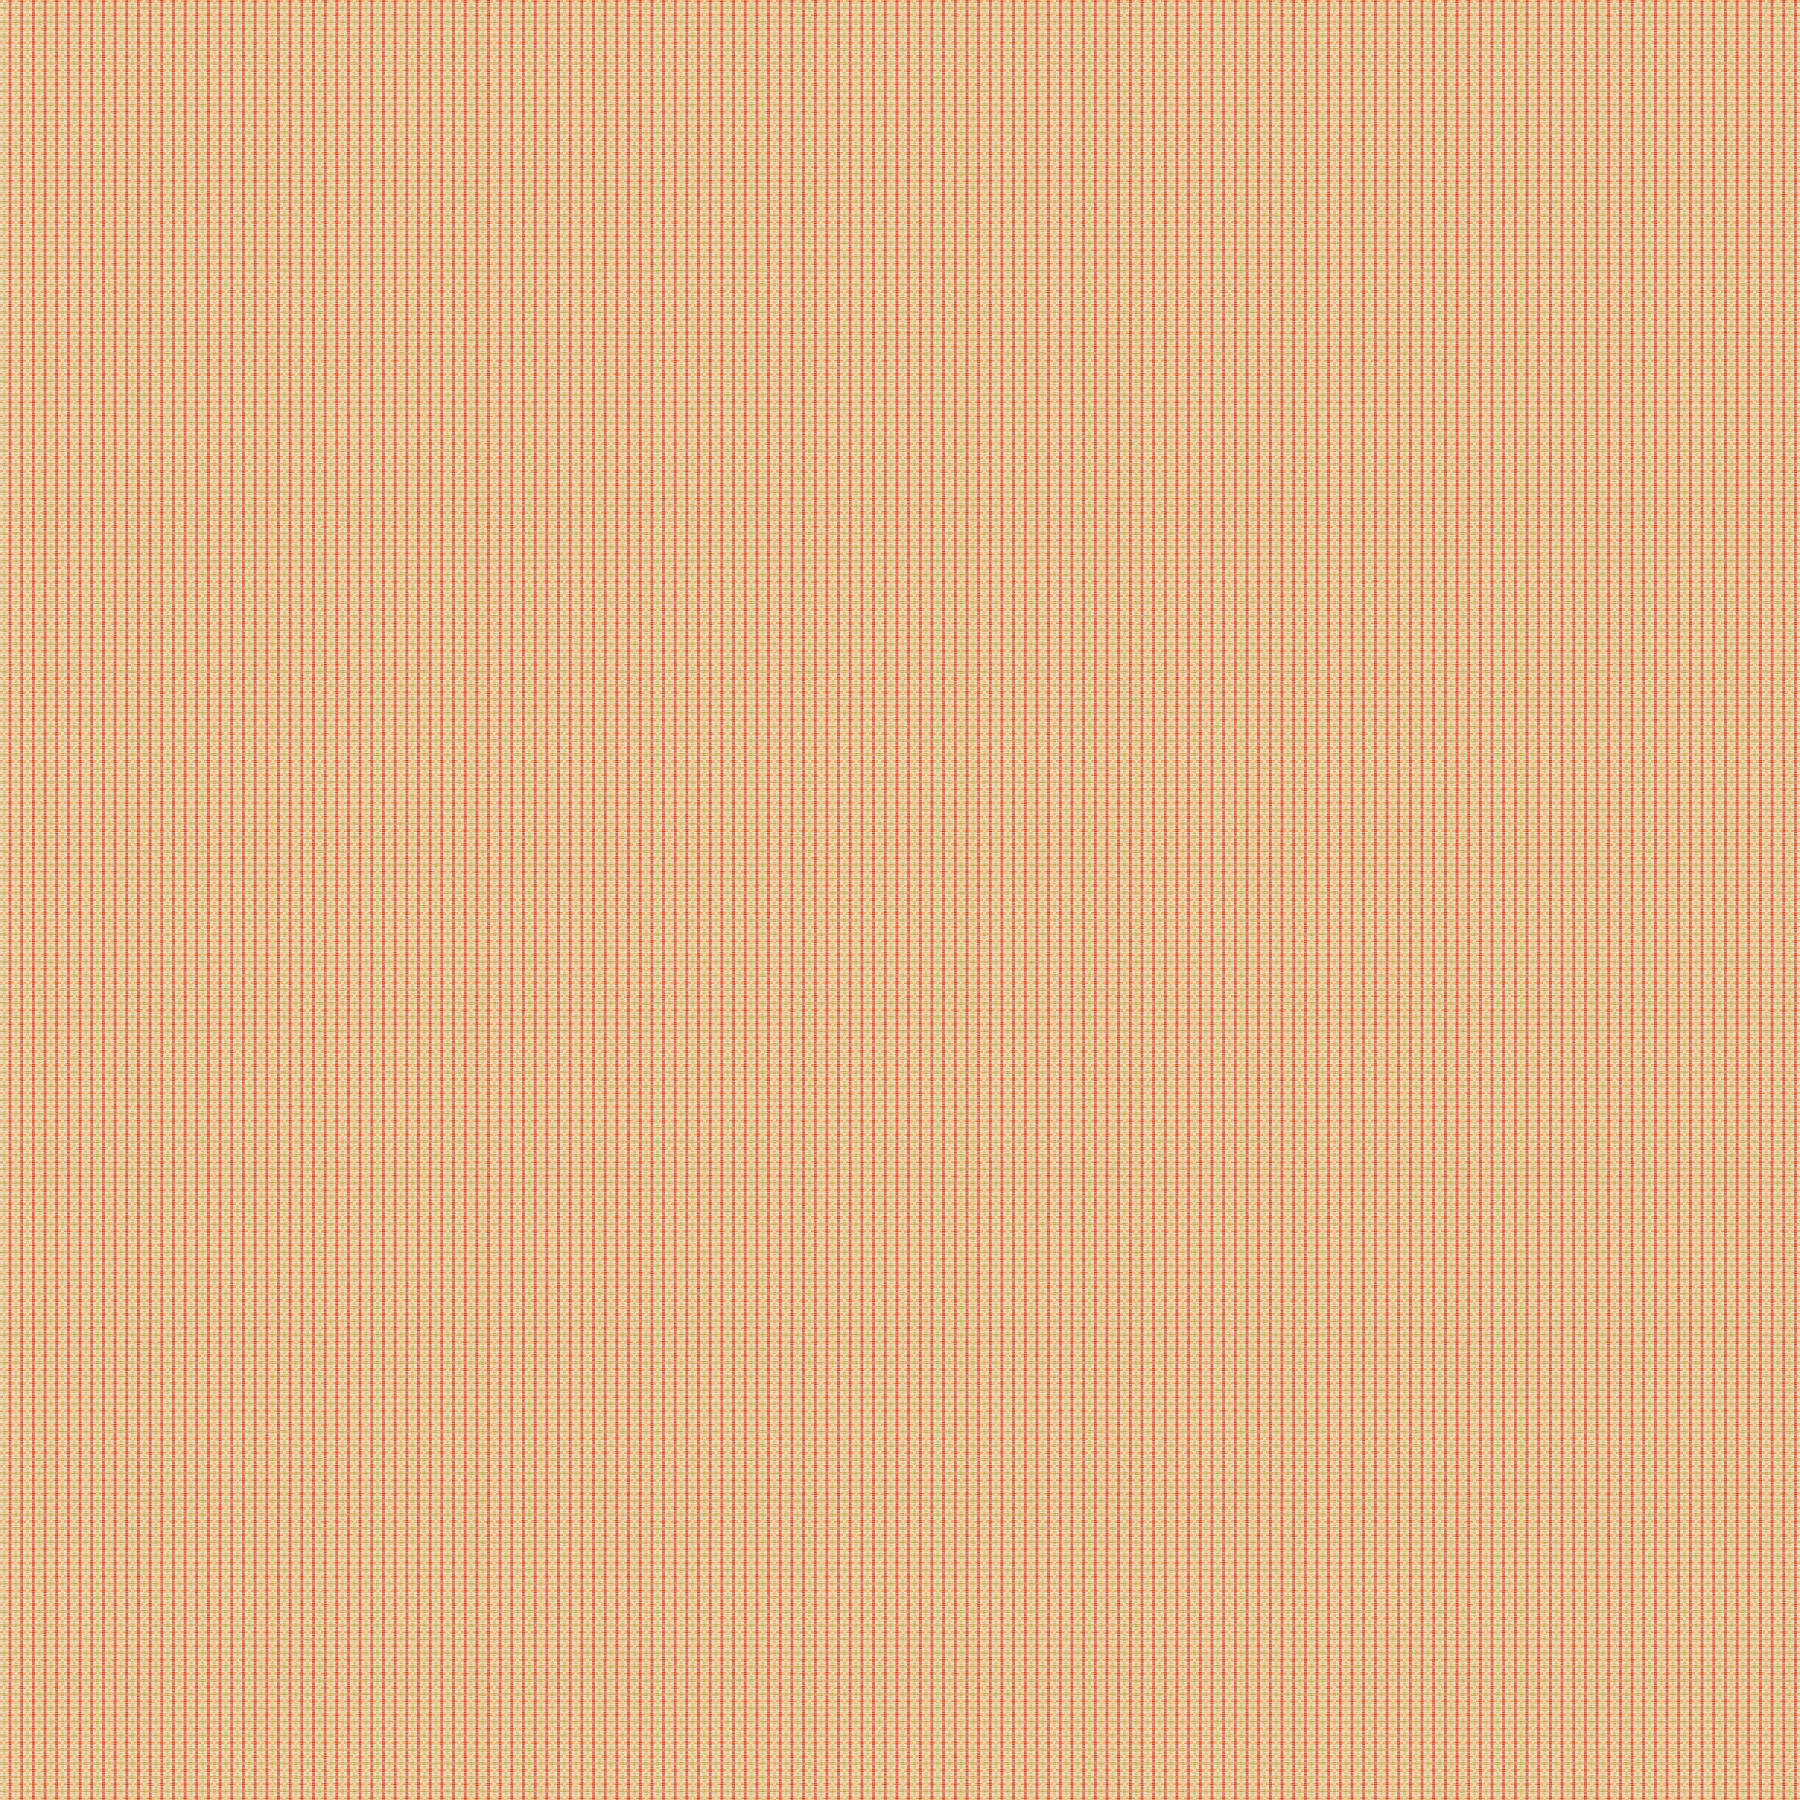 decoration fabric lismore 9 7466 060 jab anstoetz. Black Bedroom Furniture Sets. Home Design Ideas